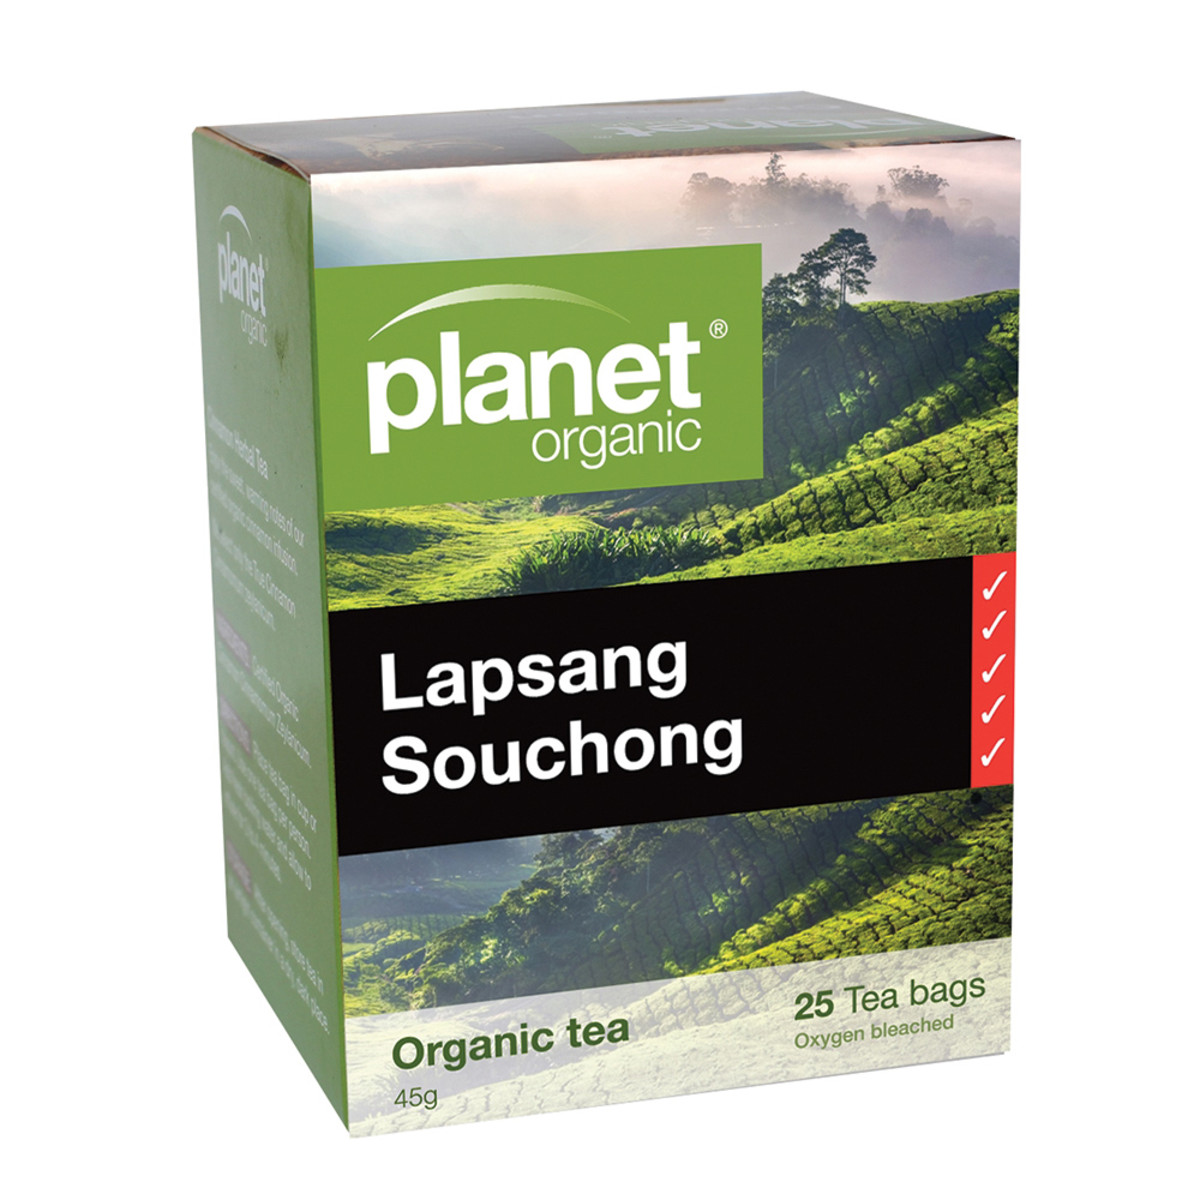 PLANET ORGANIC LAPSANG SOUCHONG ORG 25TB